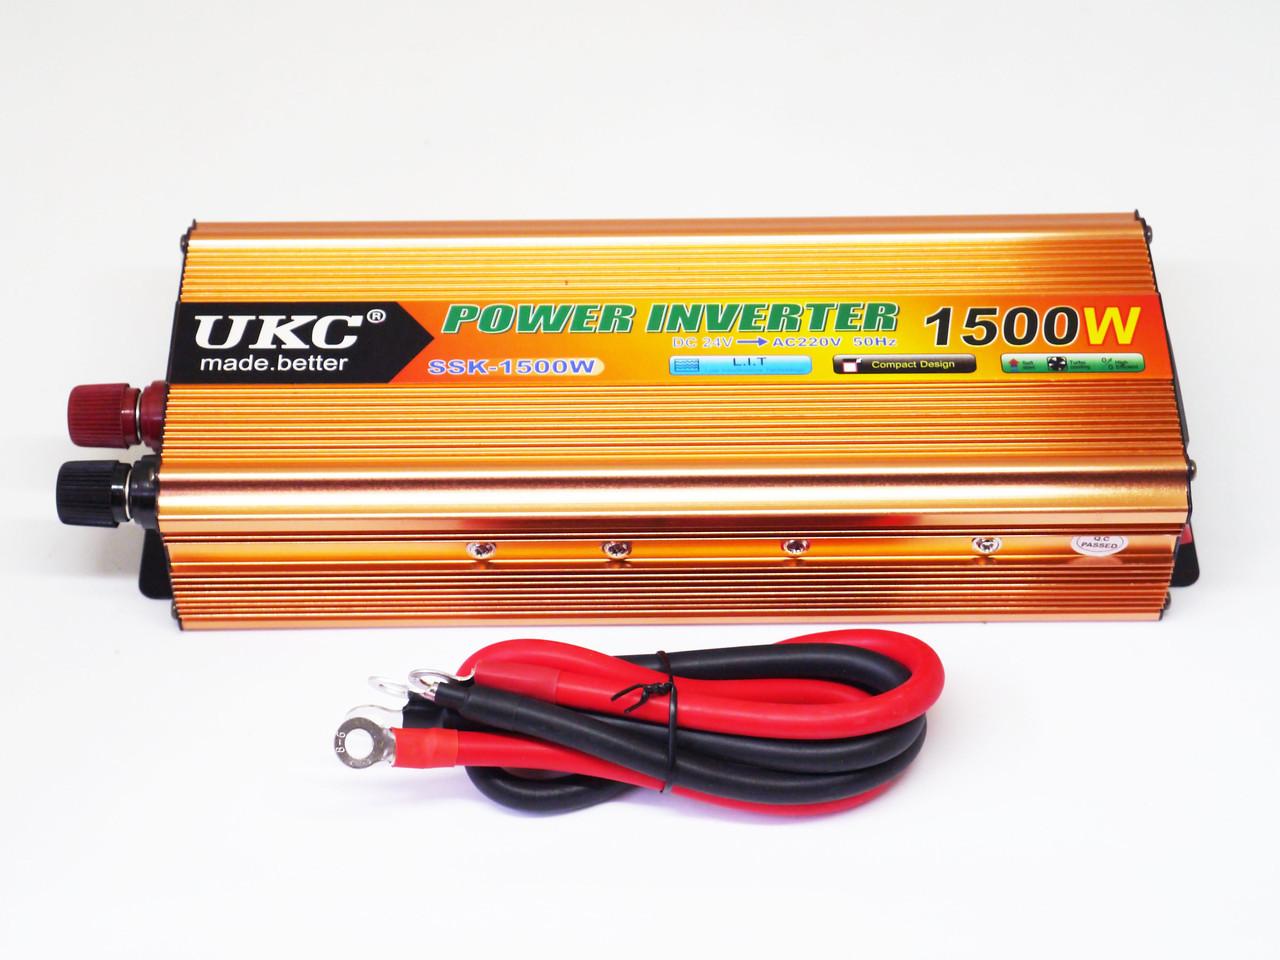 Инвертор UKC 1500W 24V Преобразователь тока AC/DC Gold